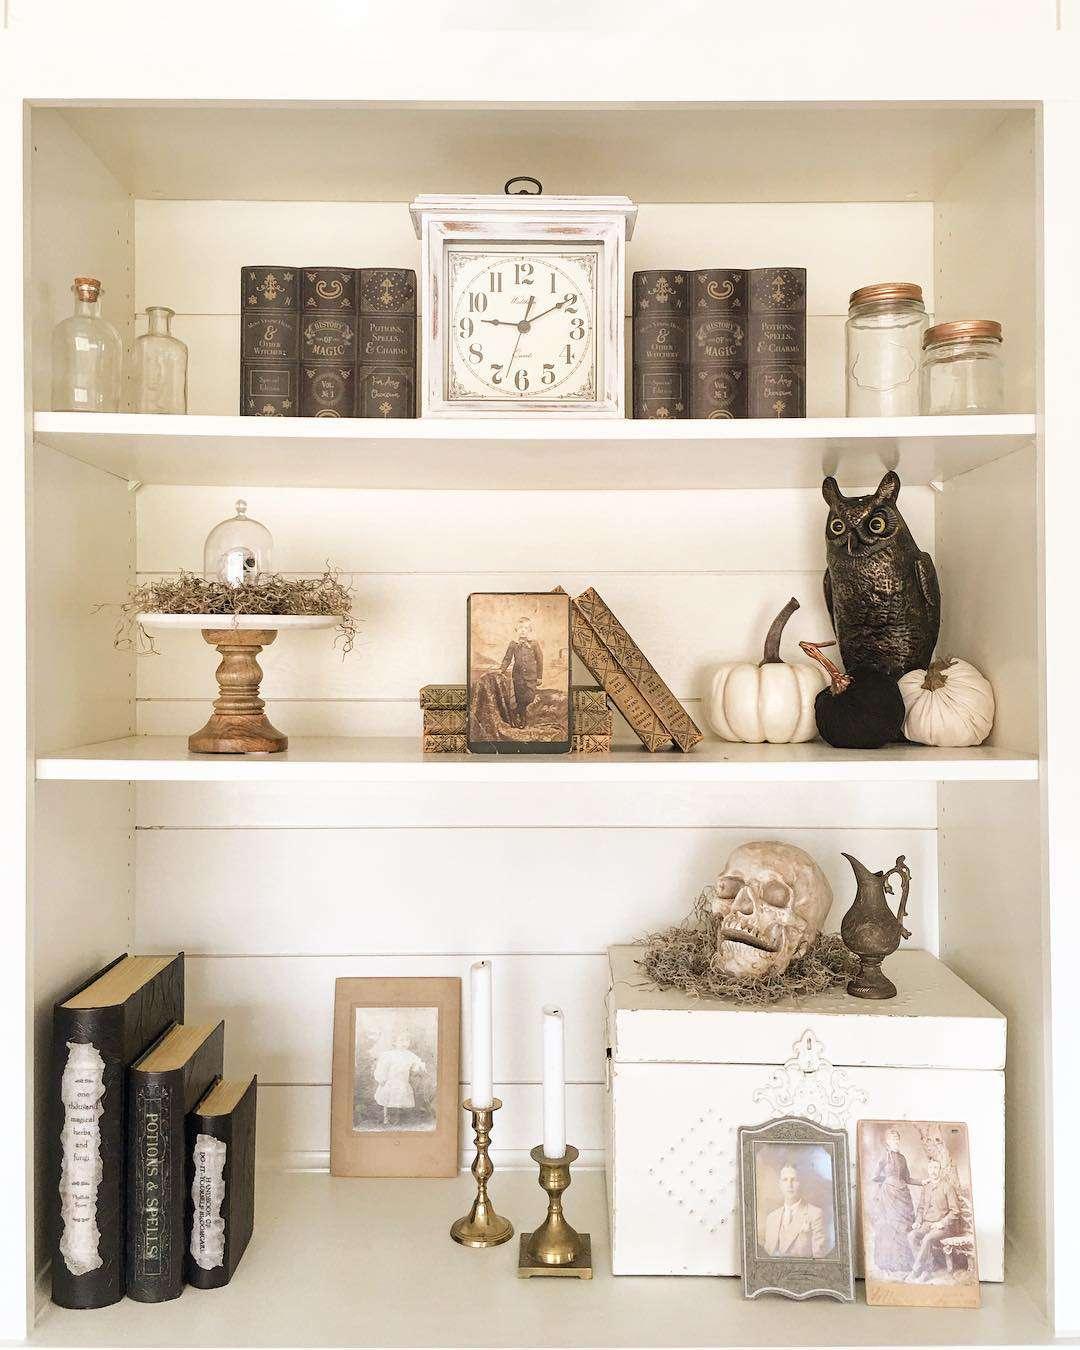 Bookshelf with skull and owl